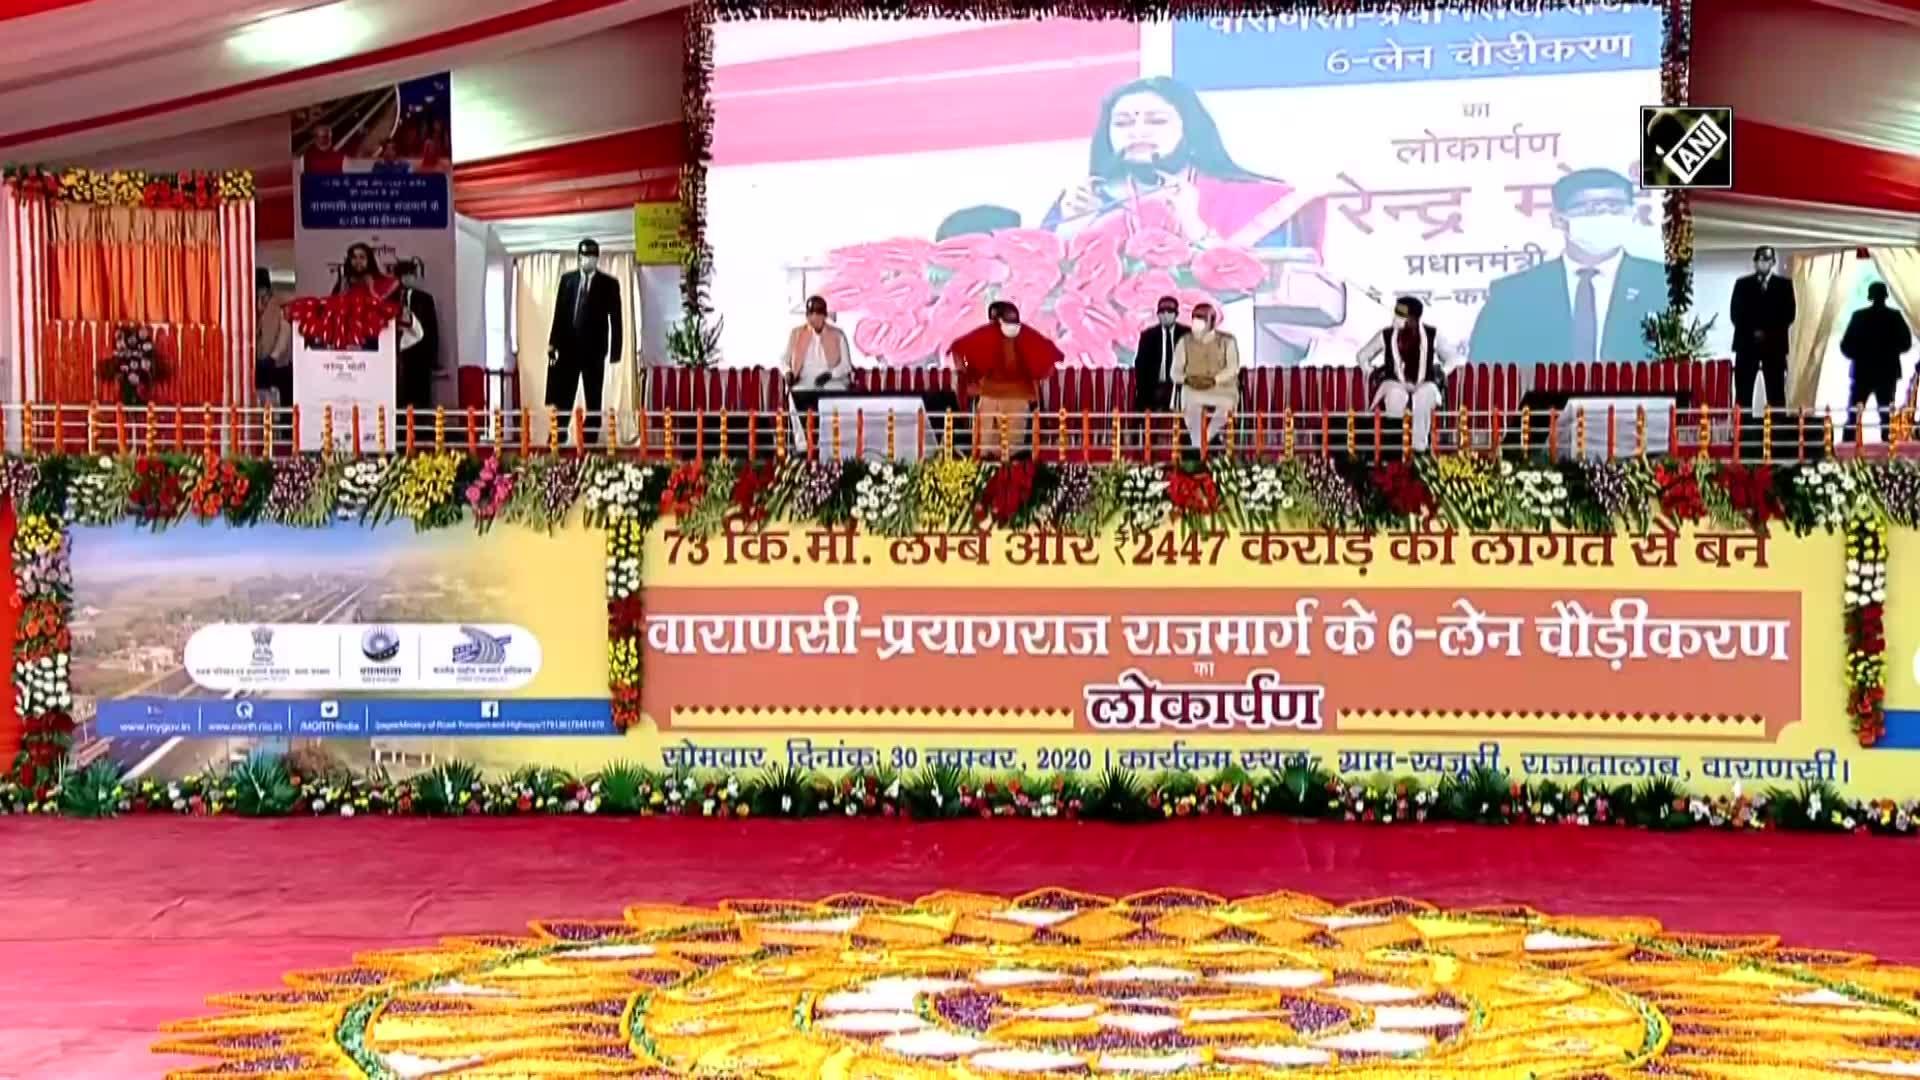 PM Modi inaugurates 6-lane widening project of Handia-Rajatalab in Varanasi